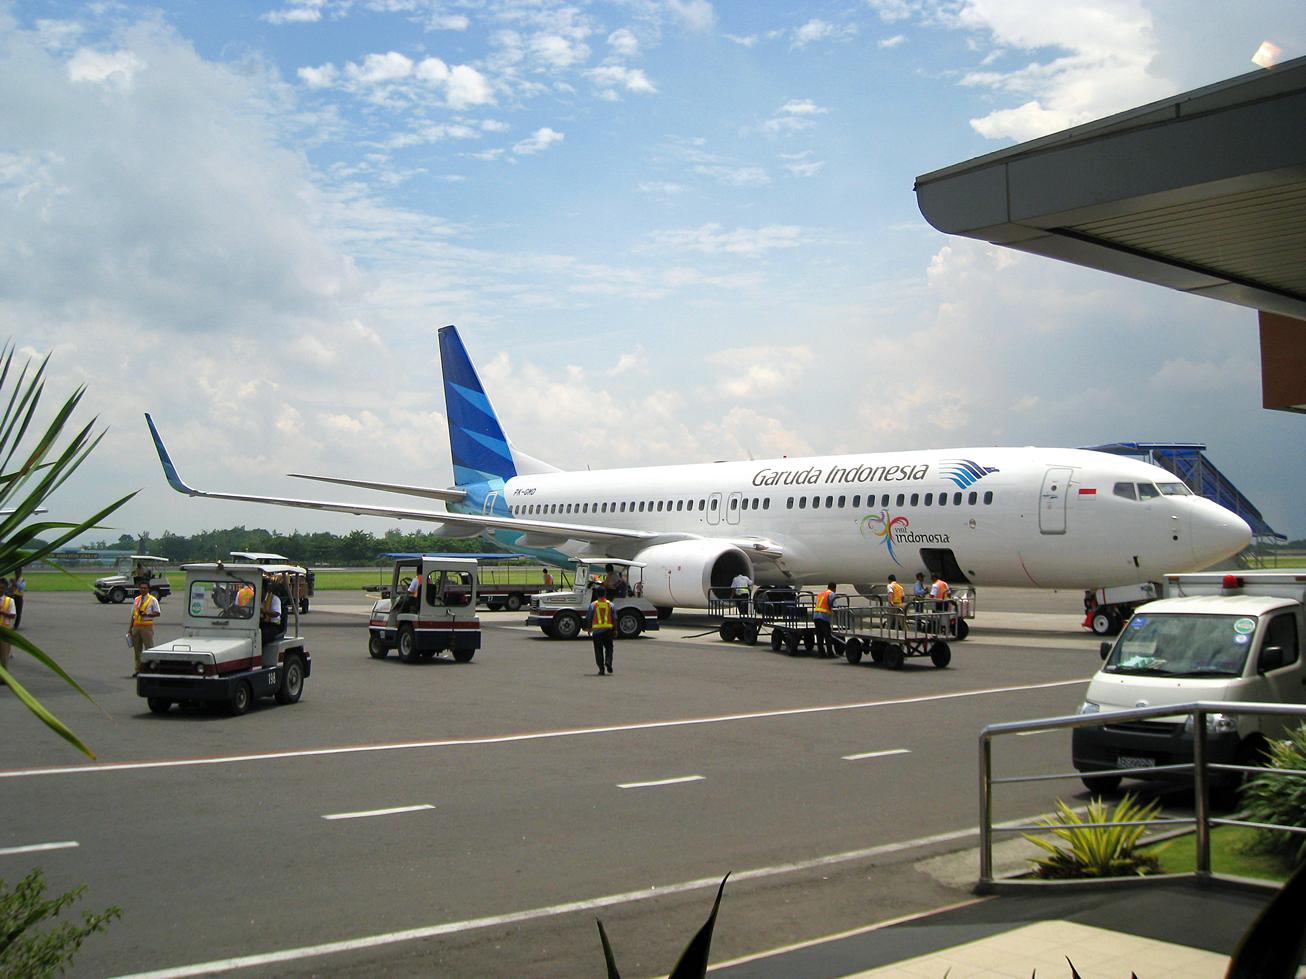 Yogyakarta's New Airport Opens Amidst Covid-19 Crises